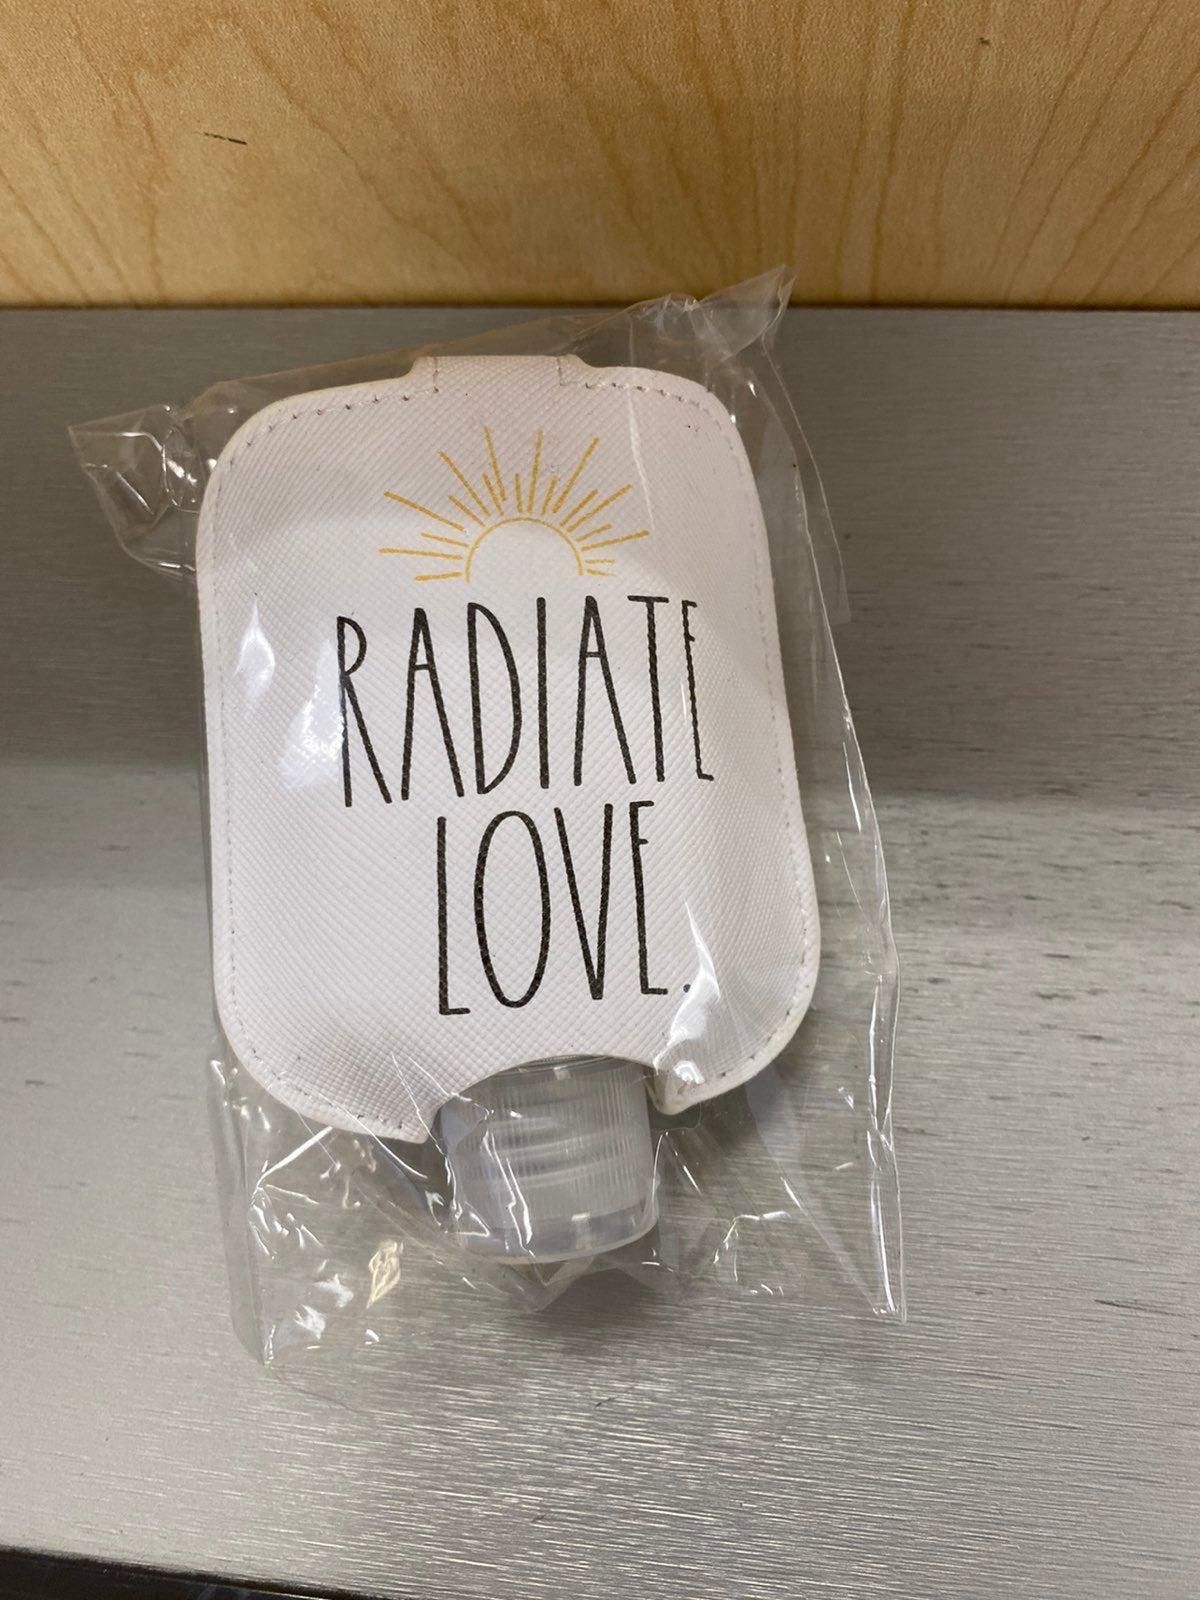 Rae Dunn Radiate Love hand sanitizer hol